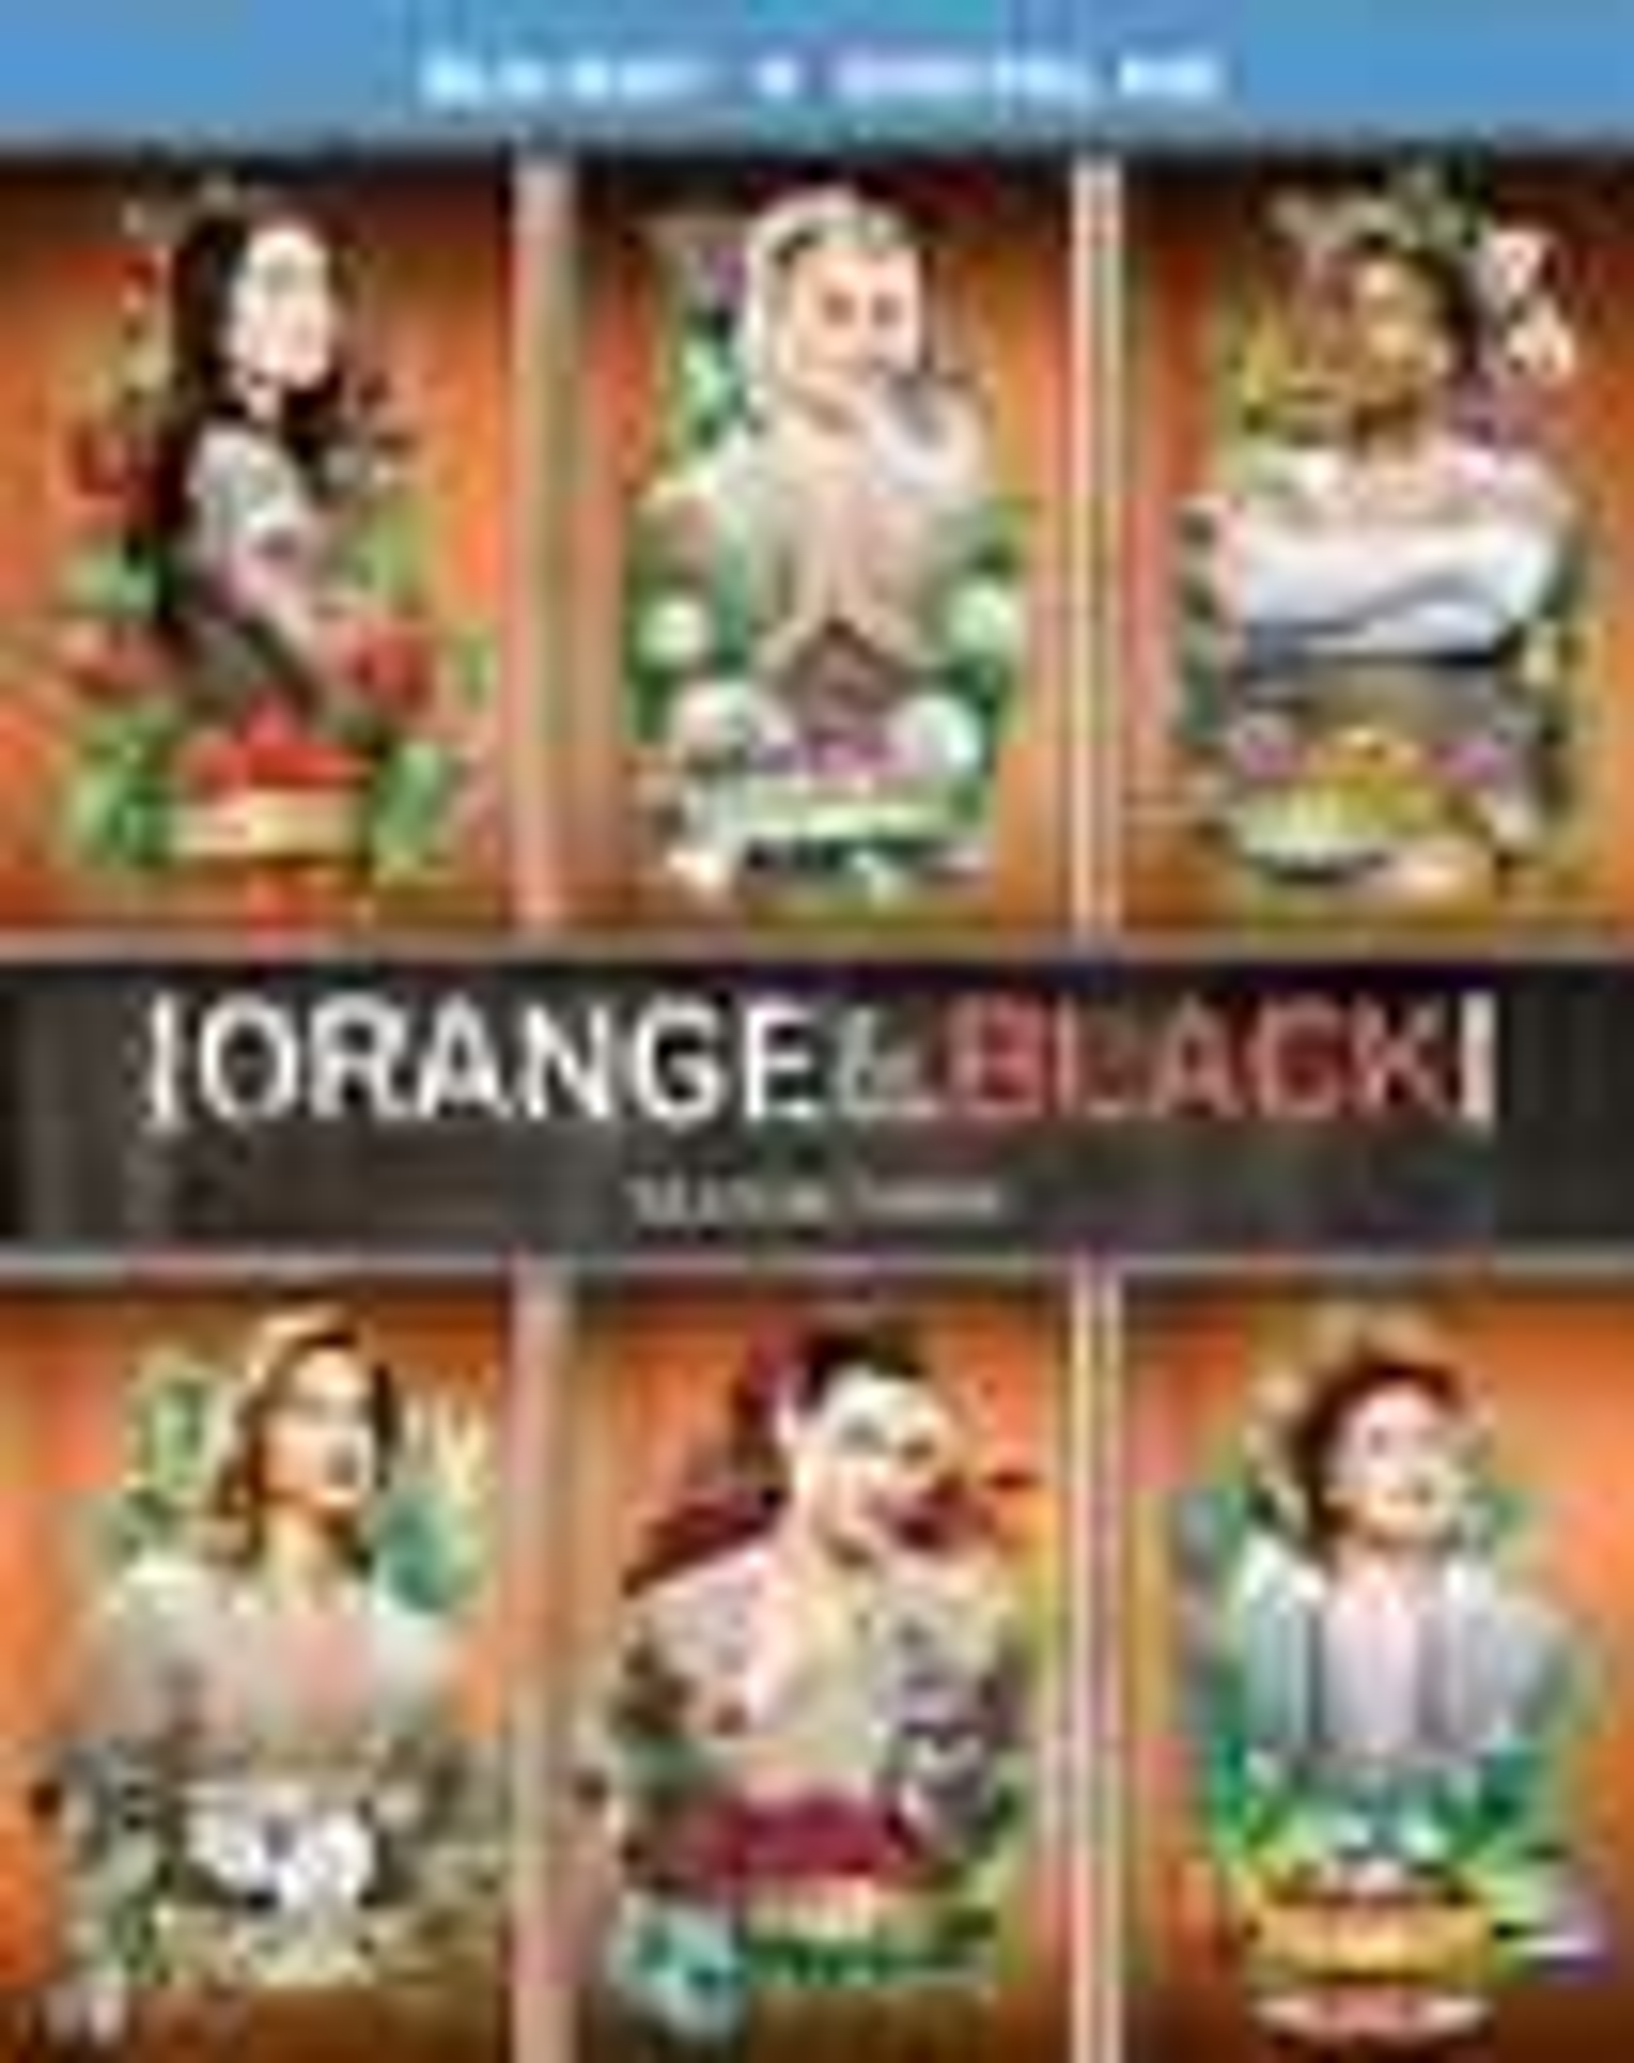 Orange Is The New Black: Season 3 [blu-ray] [3 Discs] 5134700